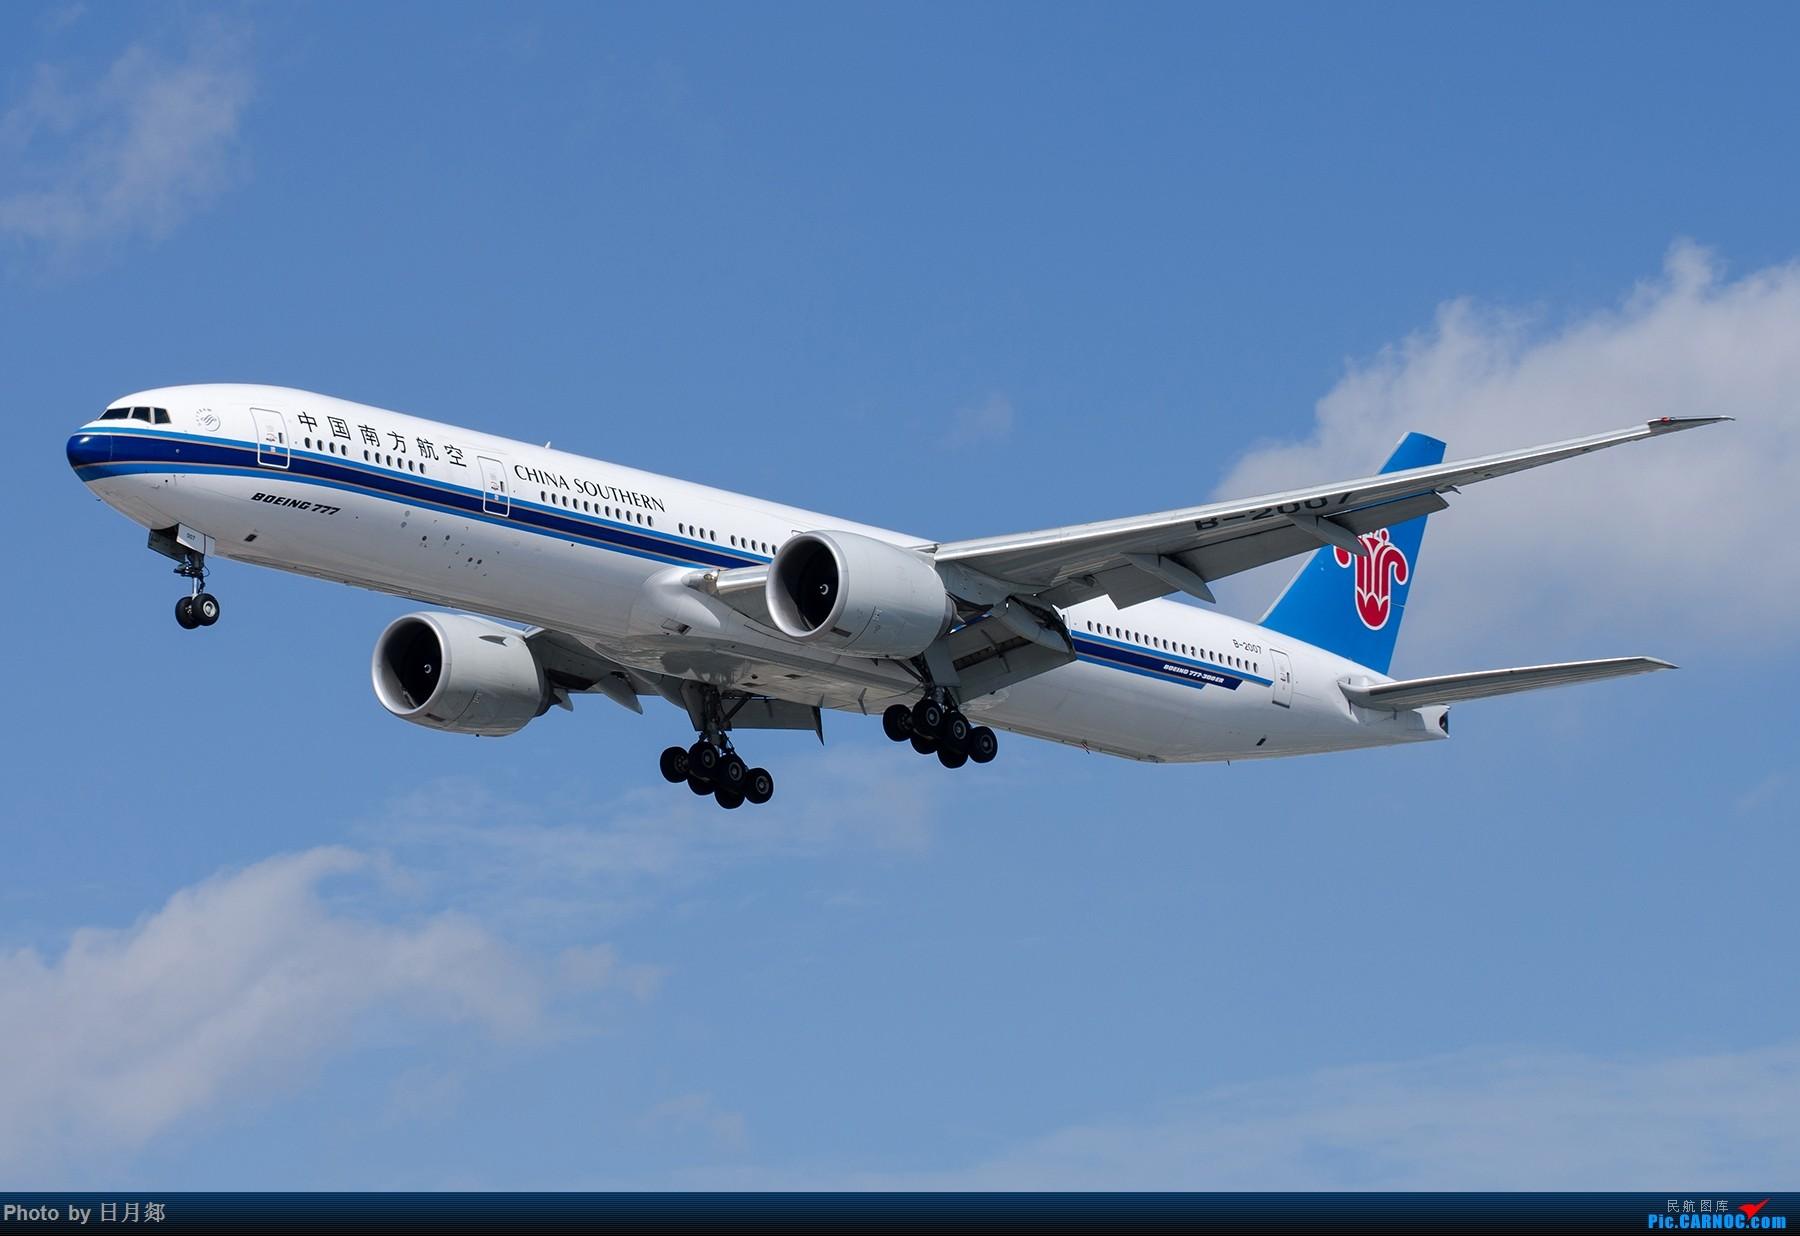 Re:[原创]【SHA拍机*1800大图】国庆的存货接着发,台风啥时候才能过去 BOEING 777-300ER B-2007 中国上海虹桥国际机场